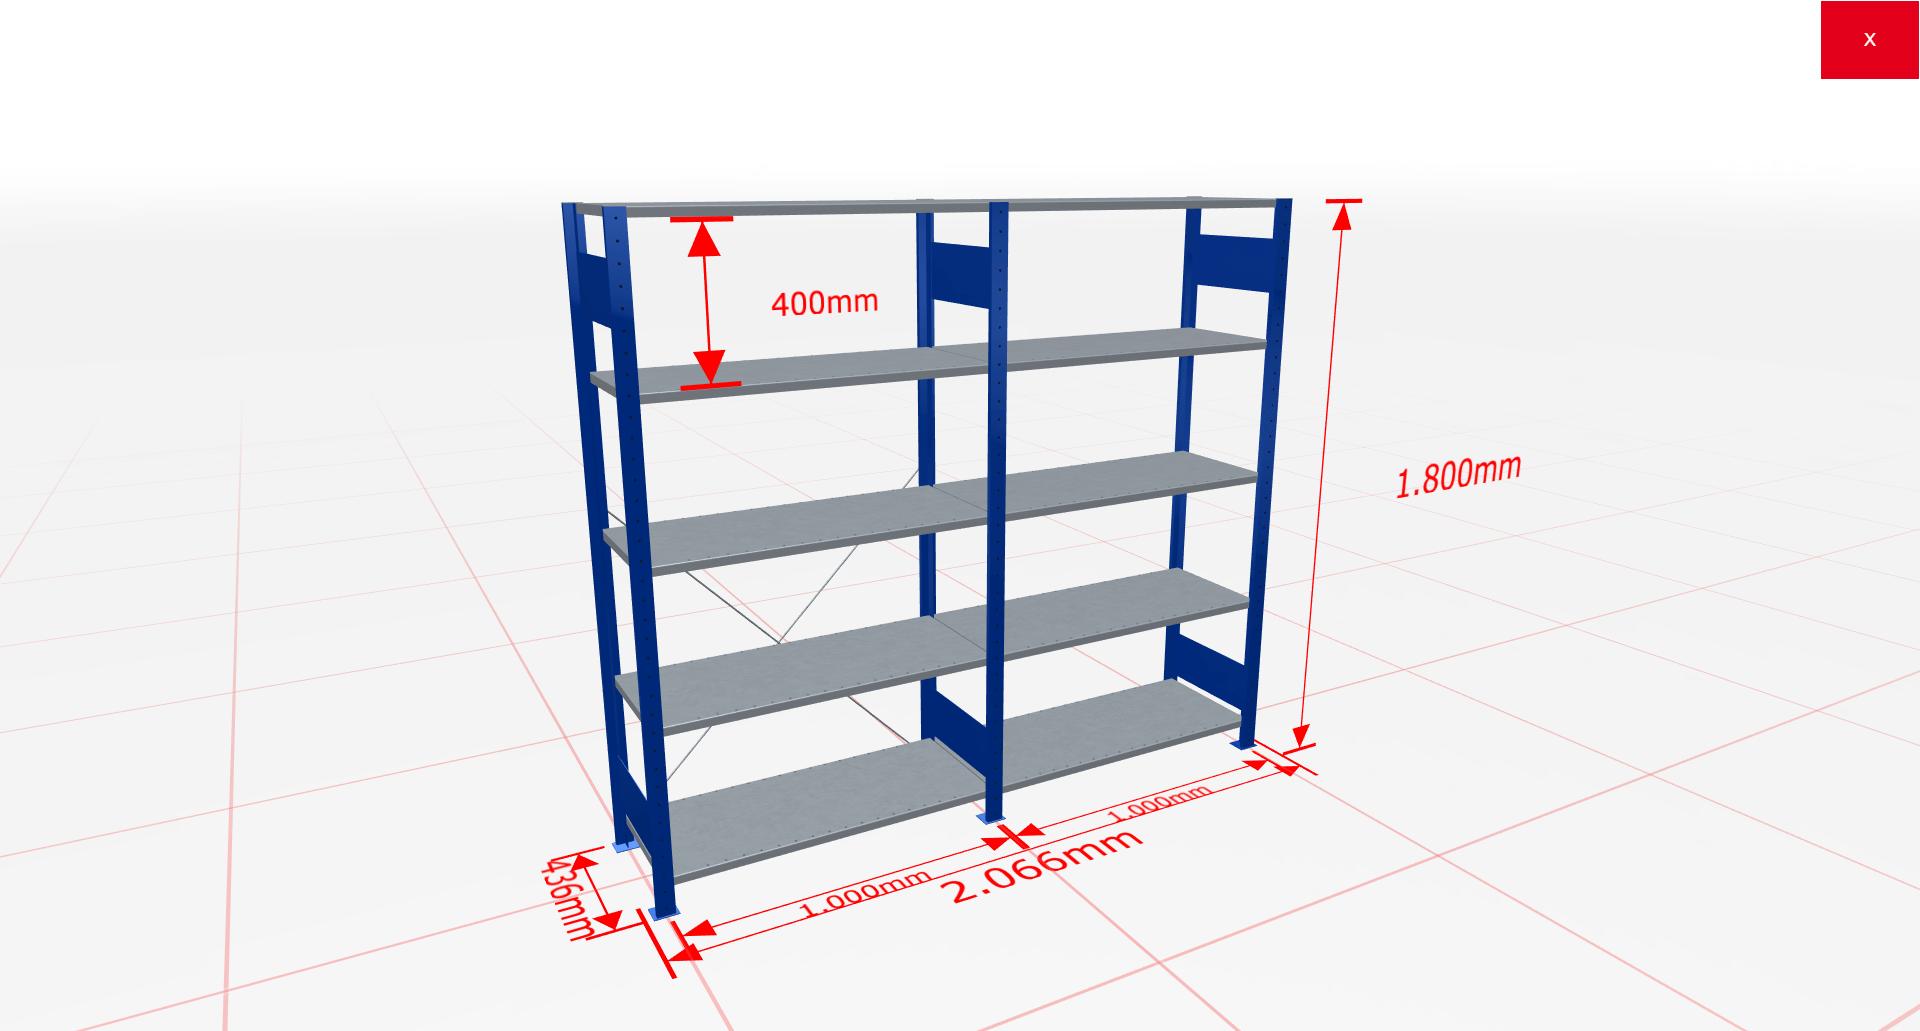 Fachbodenregal Komplettregal 1800x2066x400 mm (HxBxT) SCHULTE Lagertechnik blau 5 Ebenen  150 kg je Boden